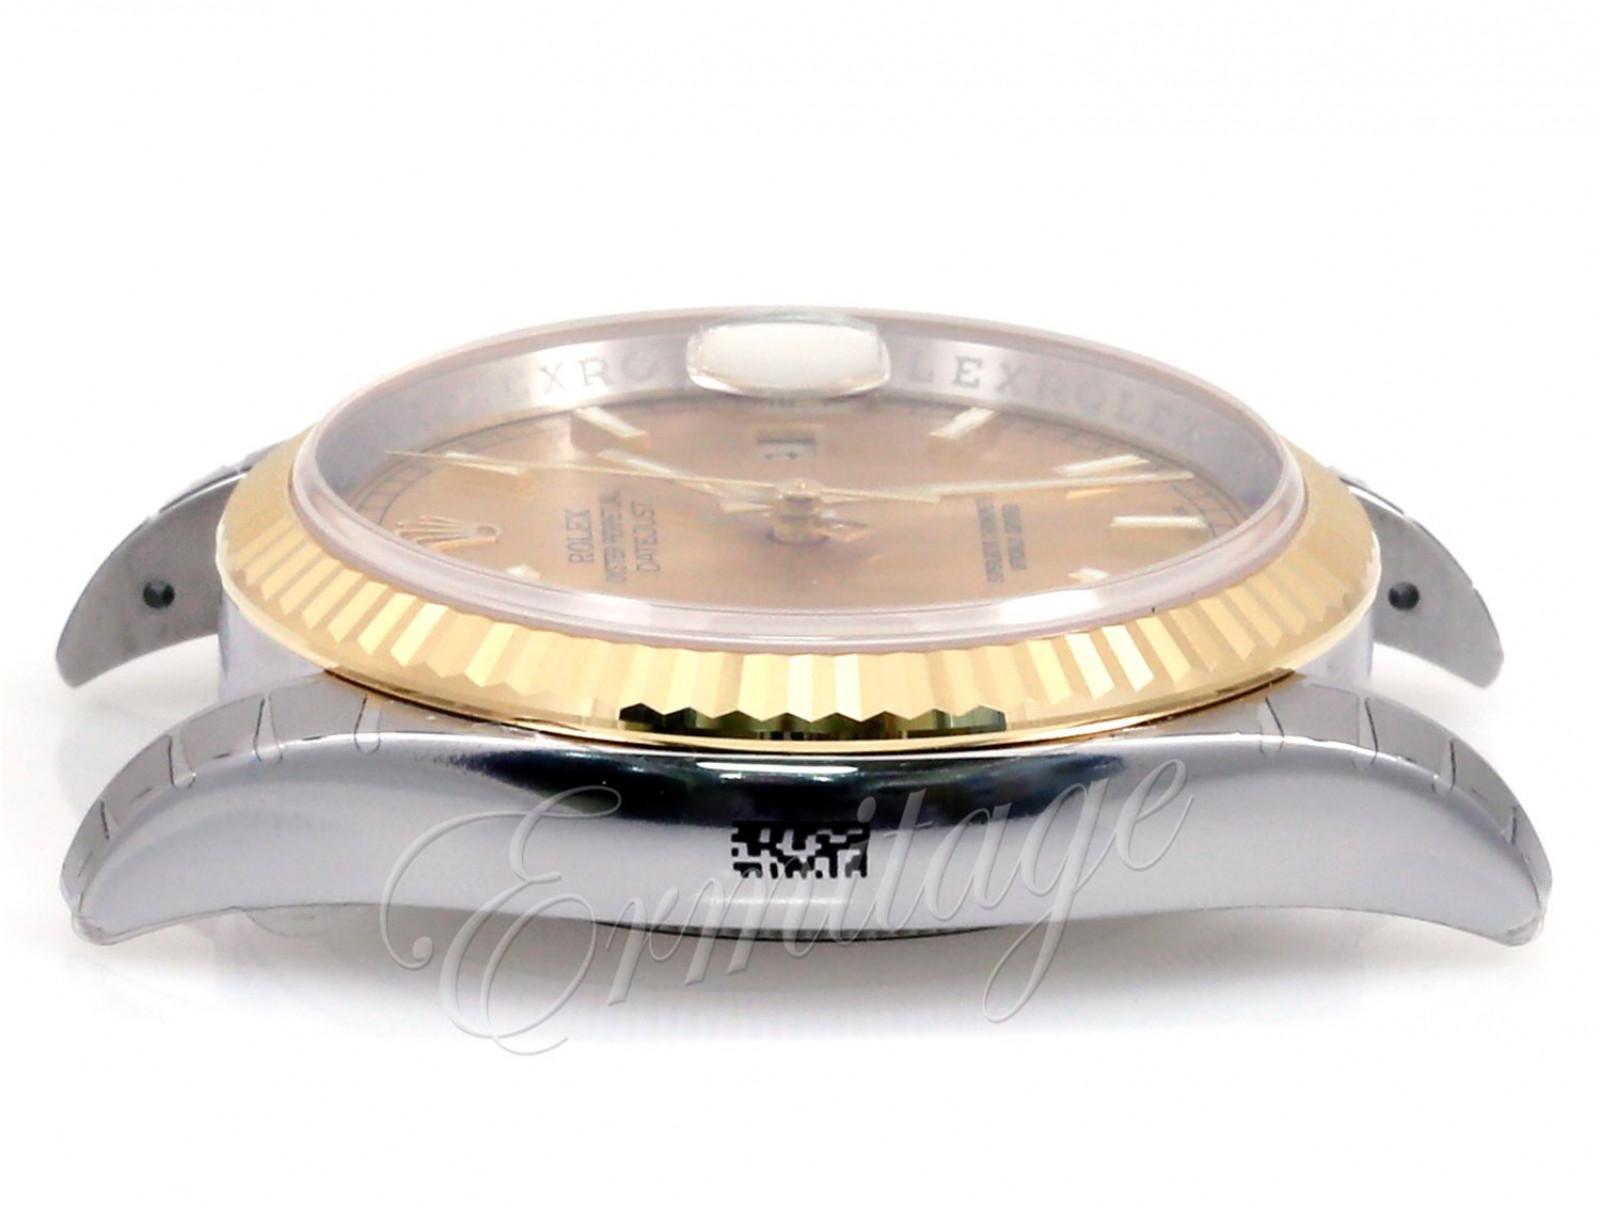 2014 Champagne Rolex Datejust Ref. 116233